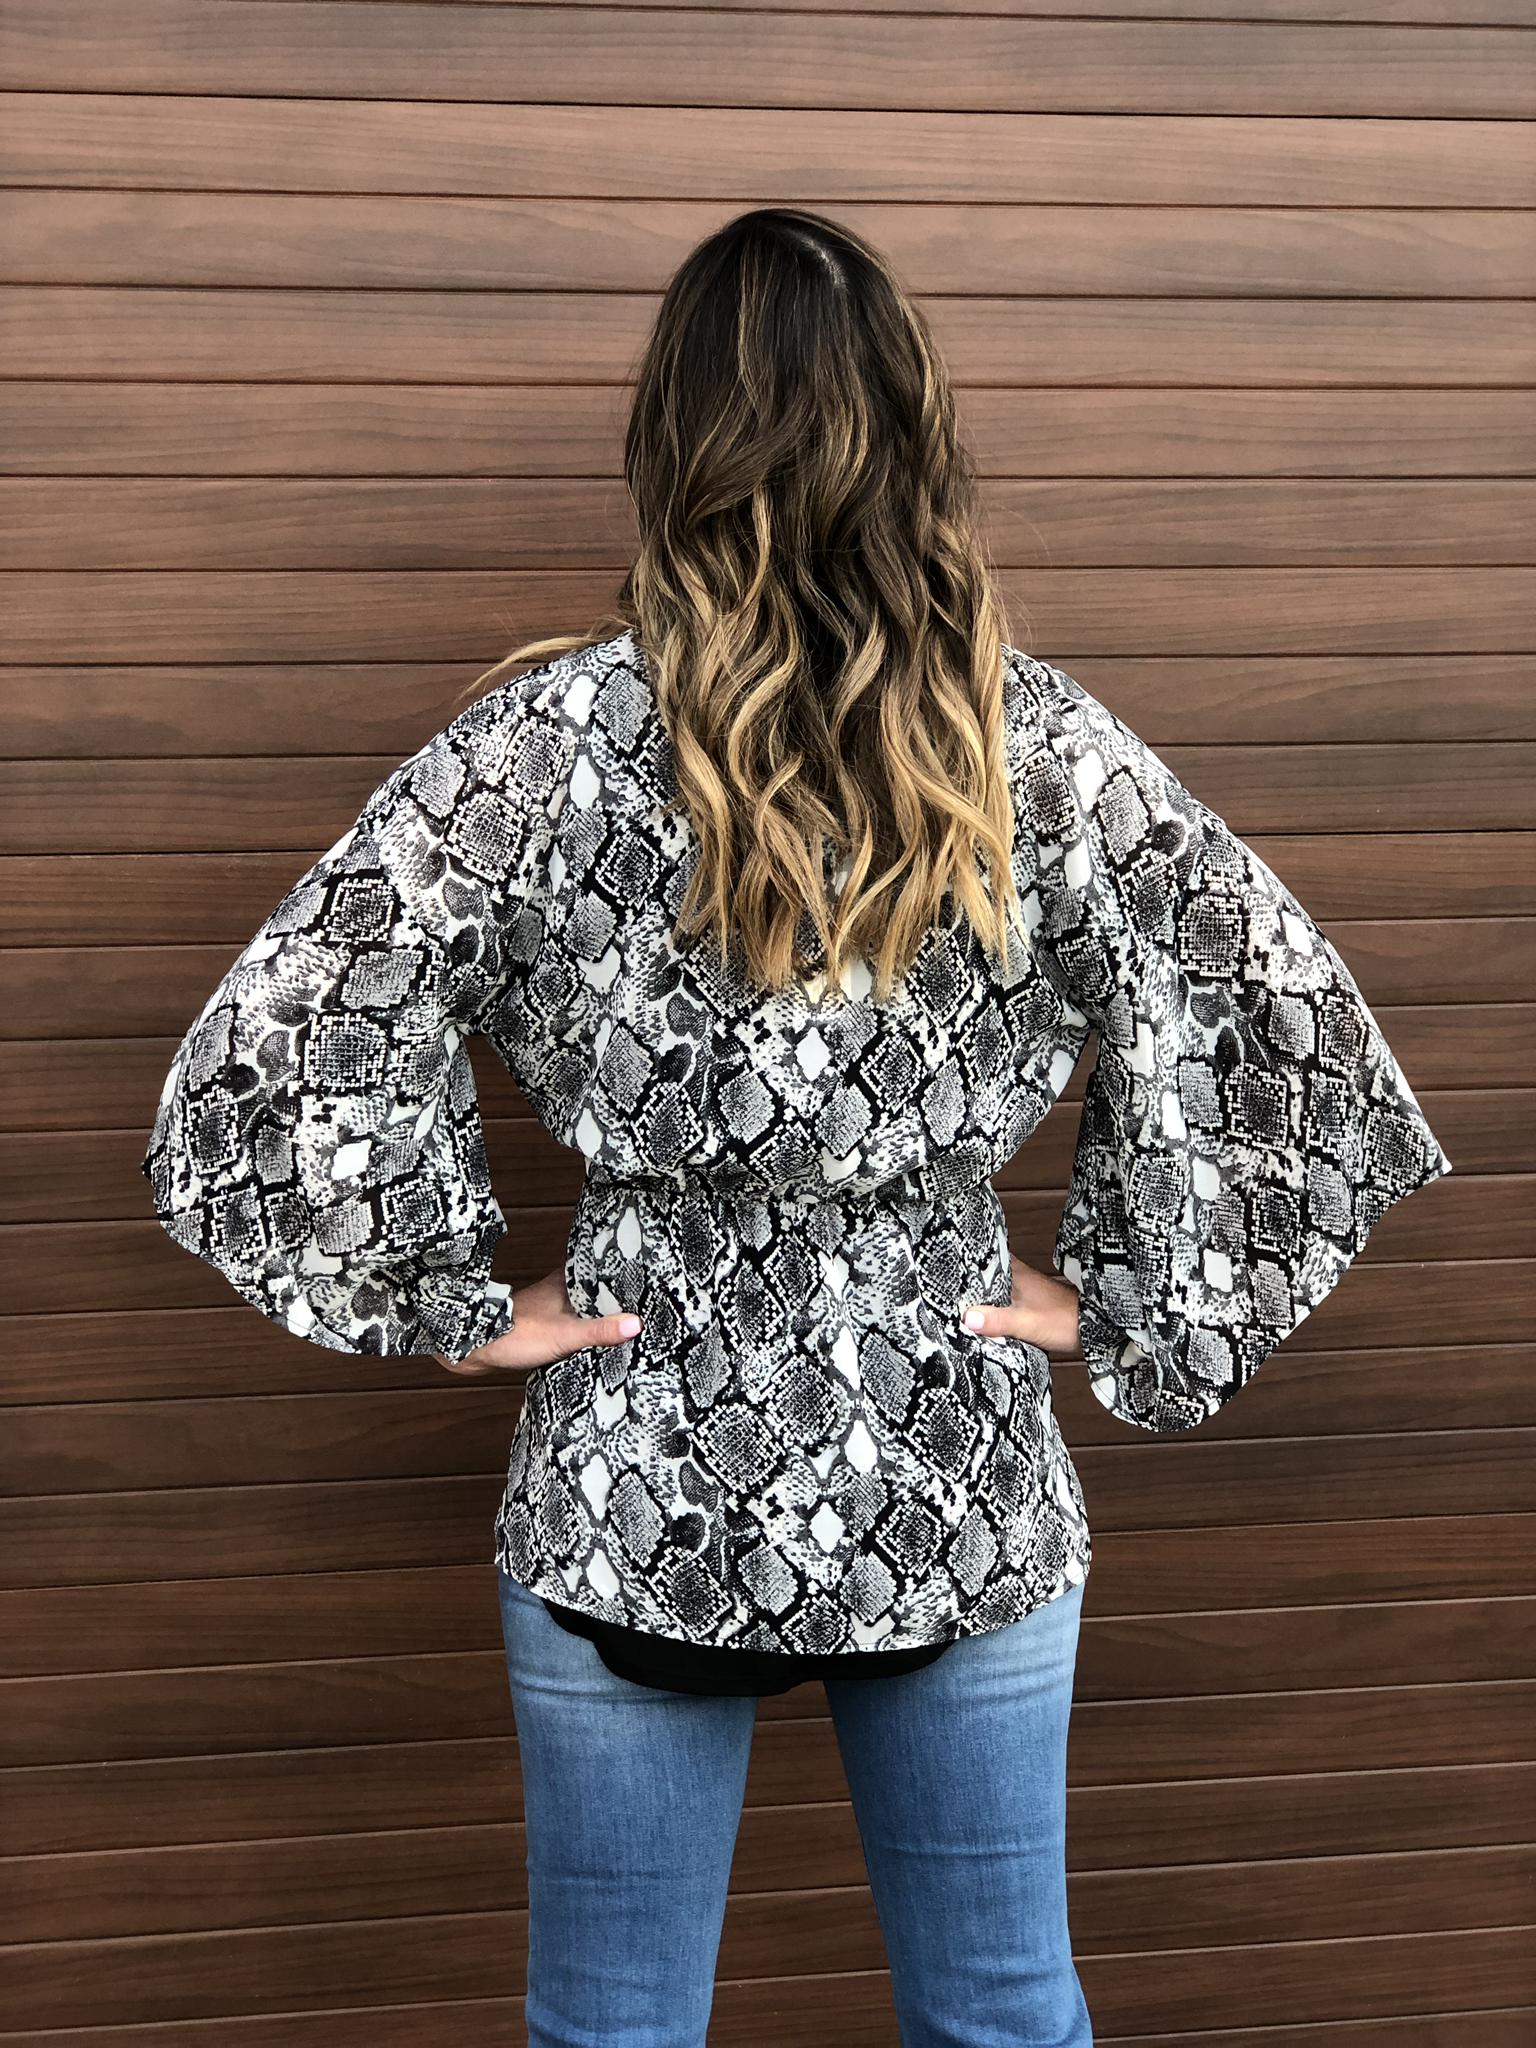 The Penelope Tie Kimono